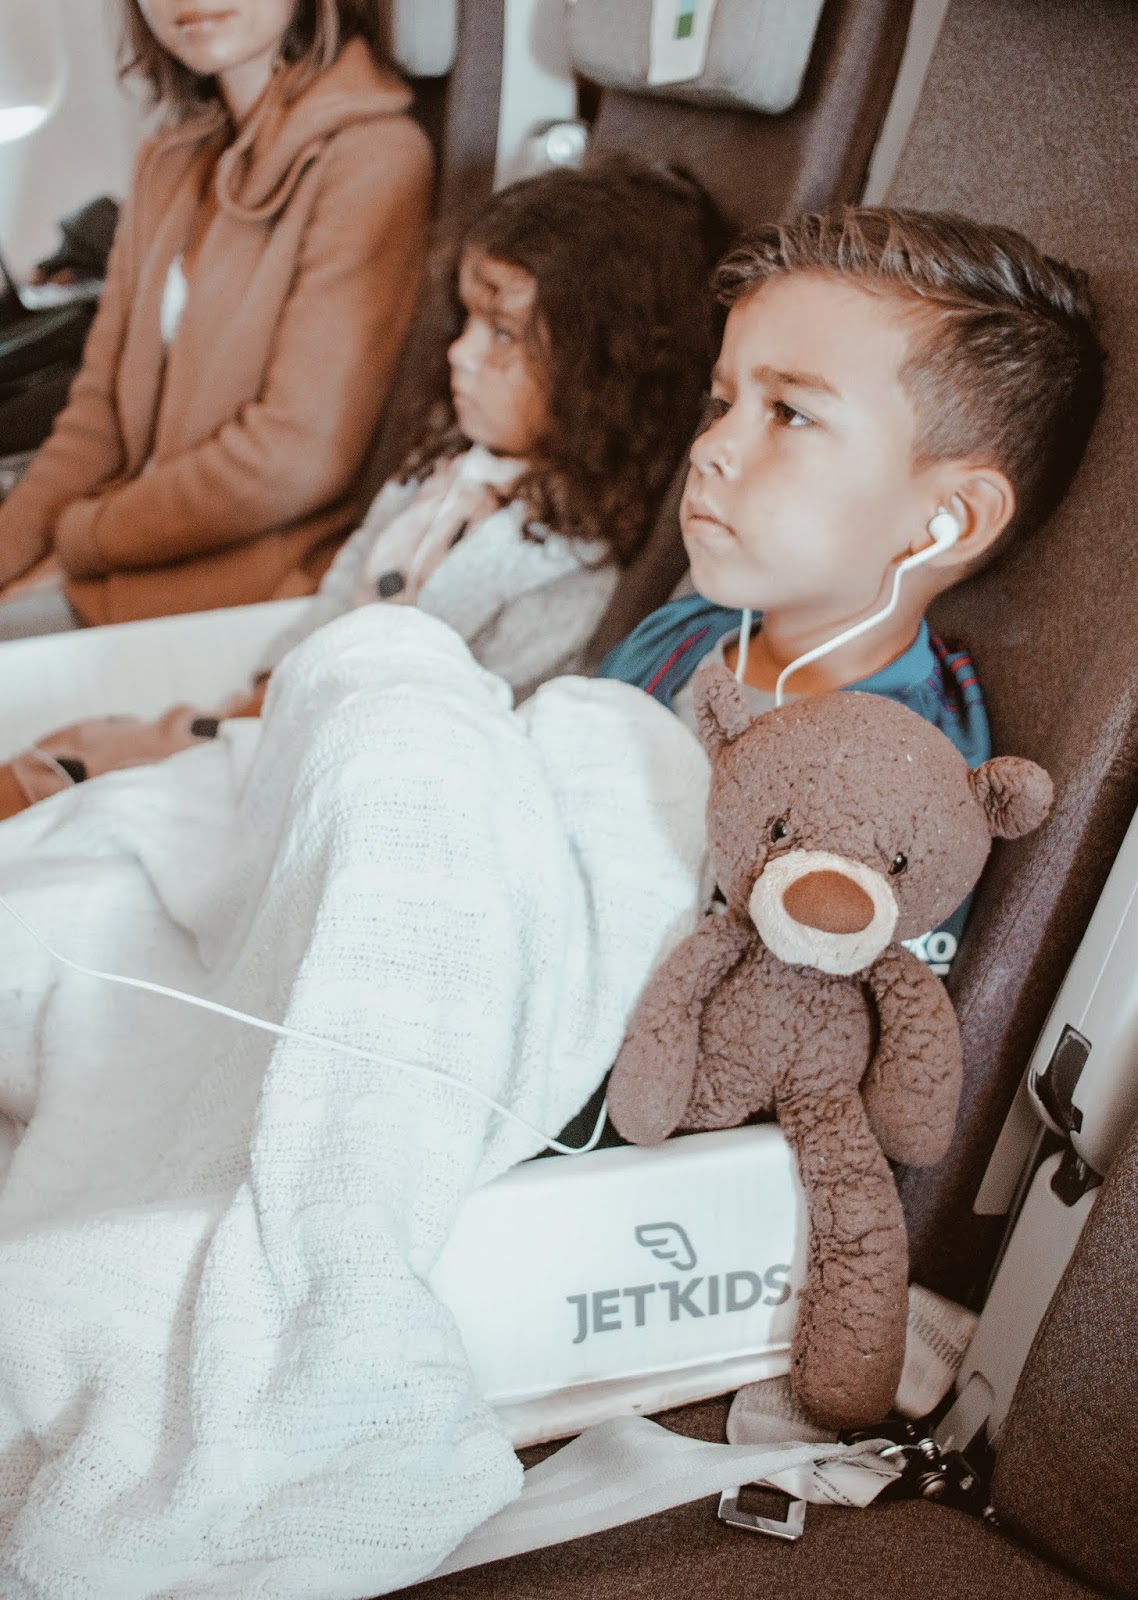 10 tips to keep kids happy in flight